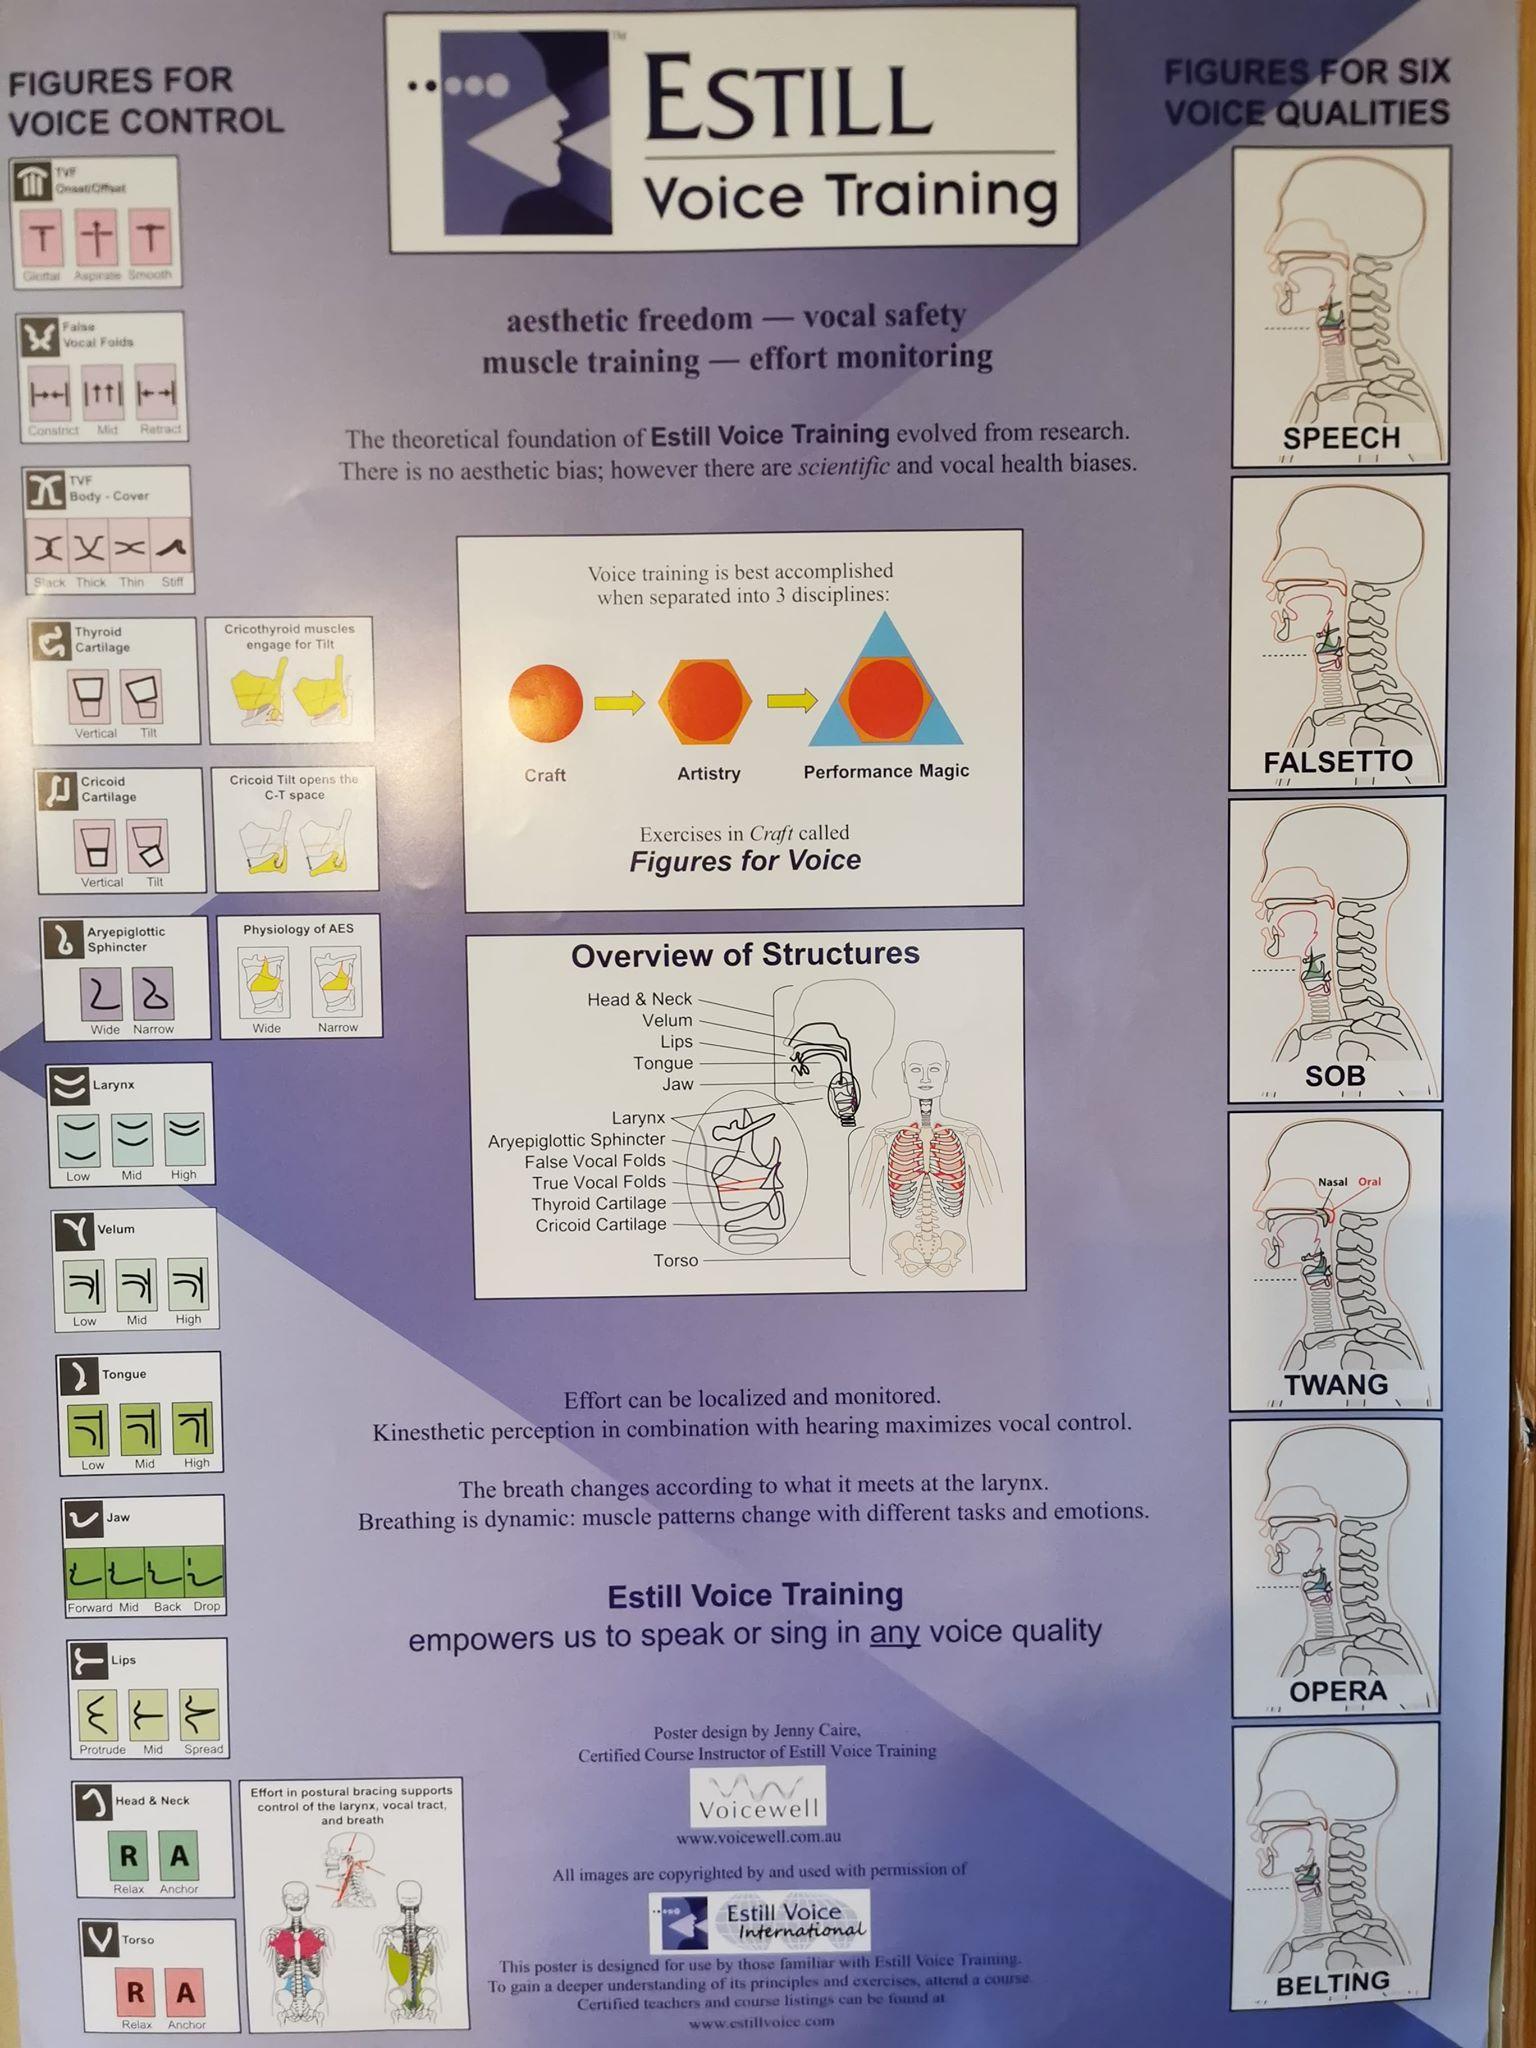 Estill Voice Training Overview